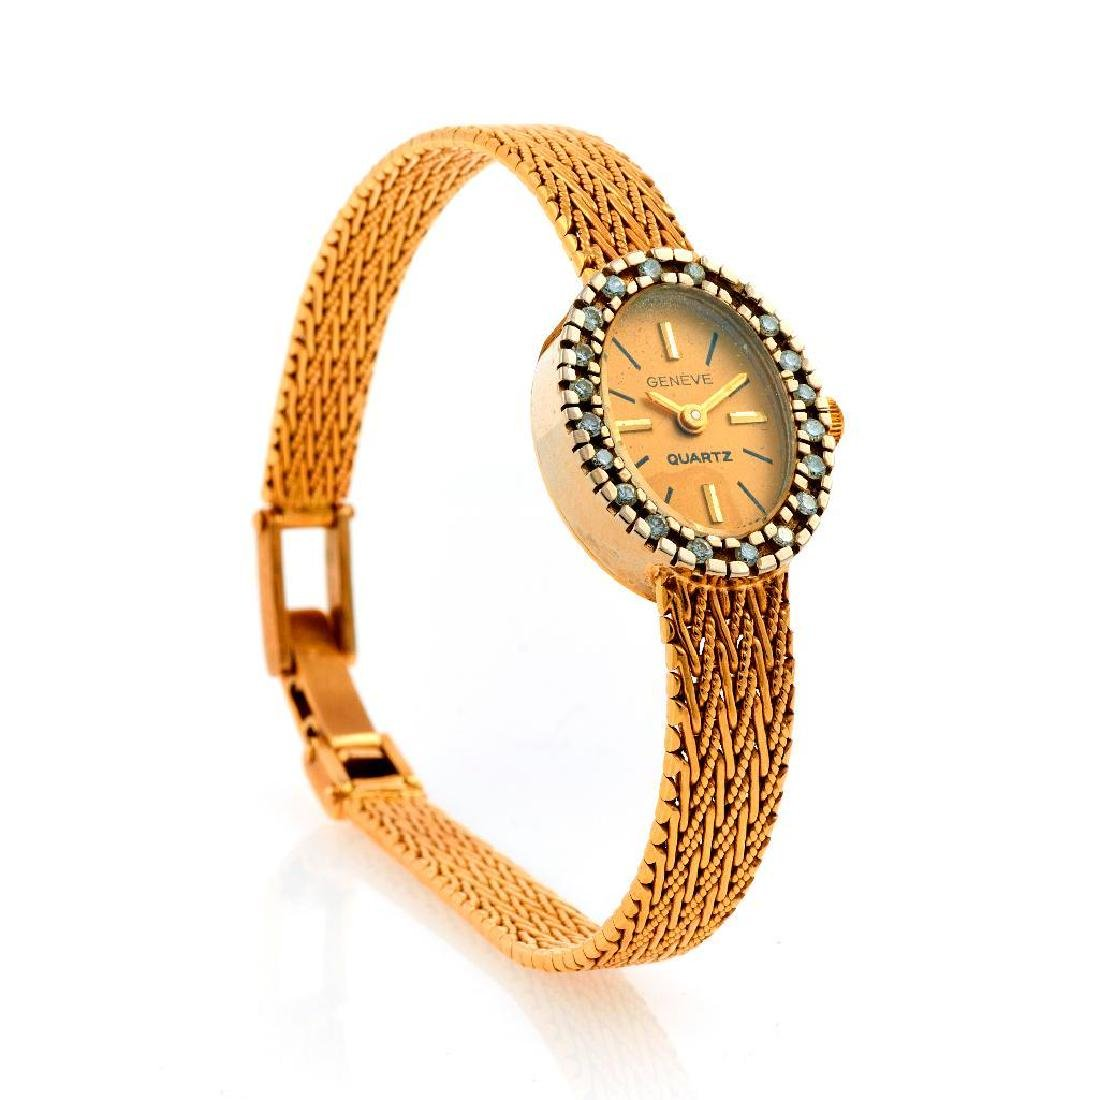 Geneve ladies diamond and 14k gold wristwatch